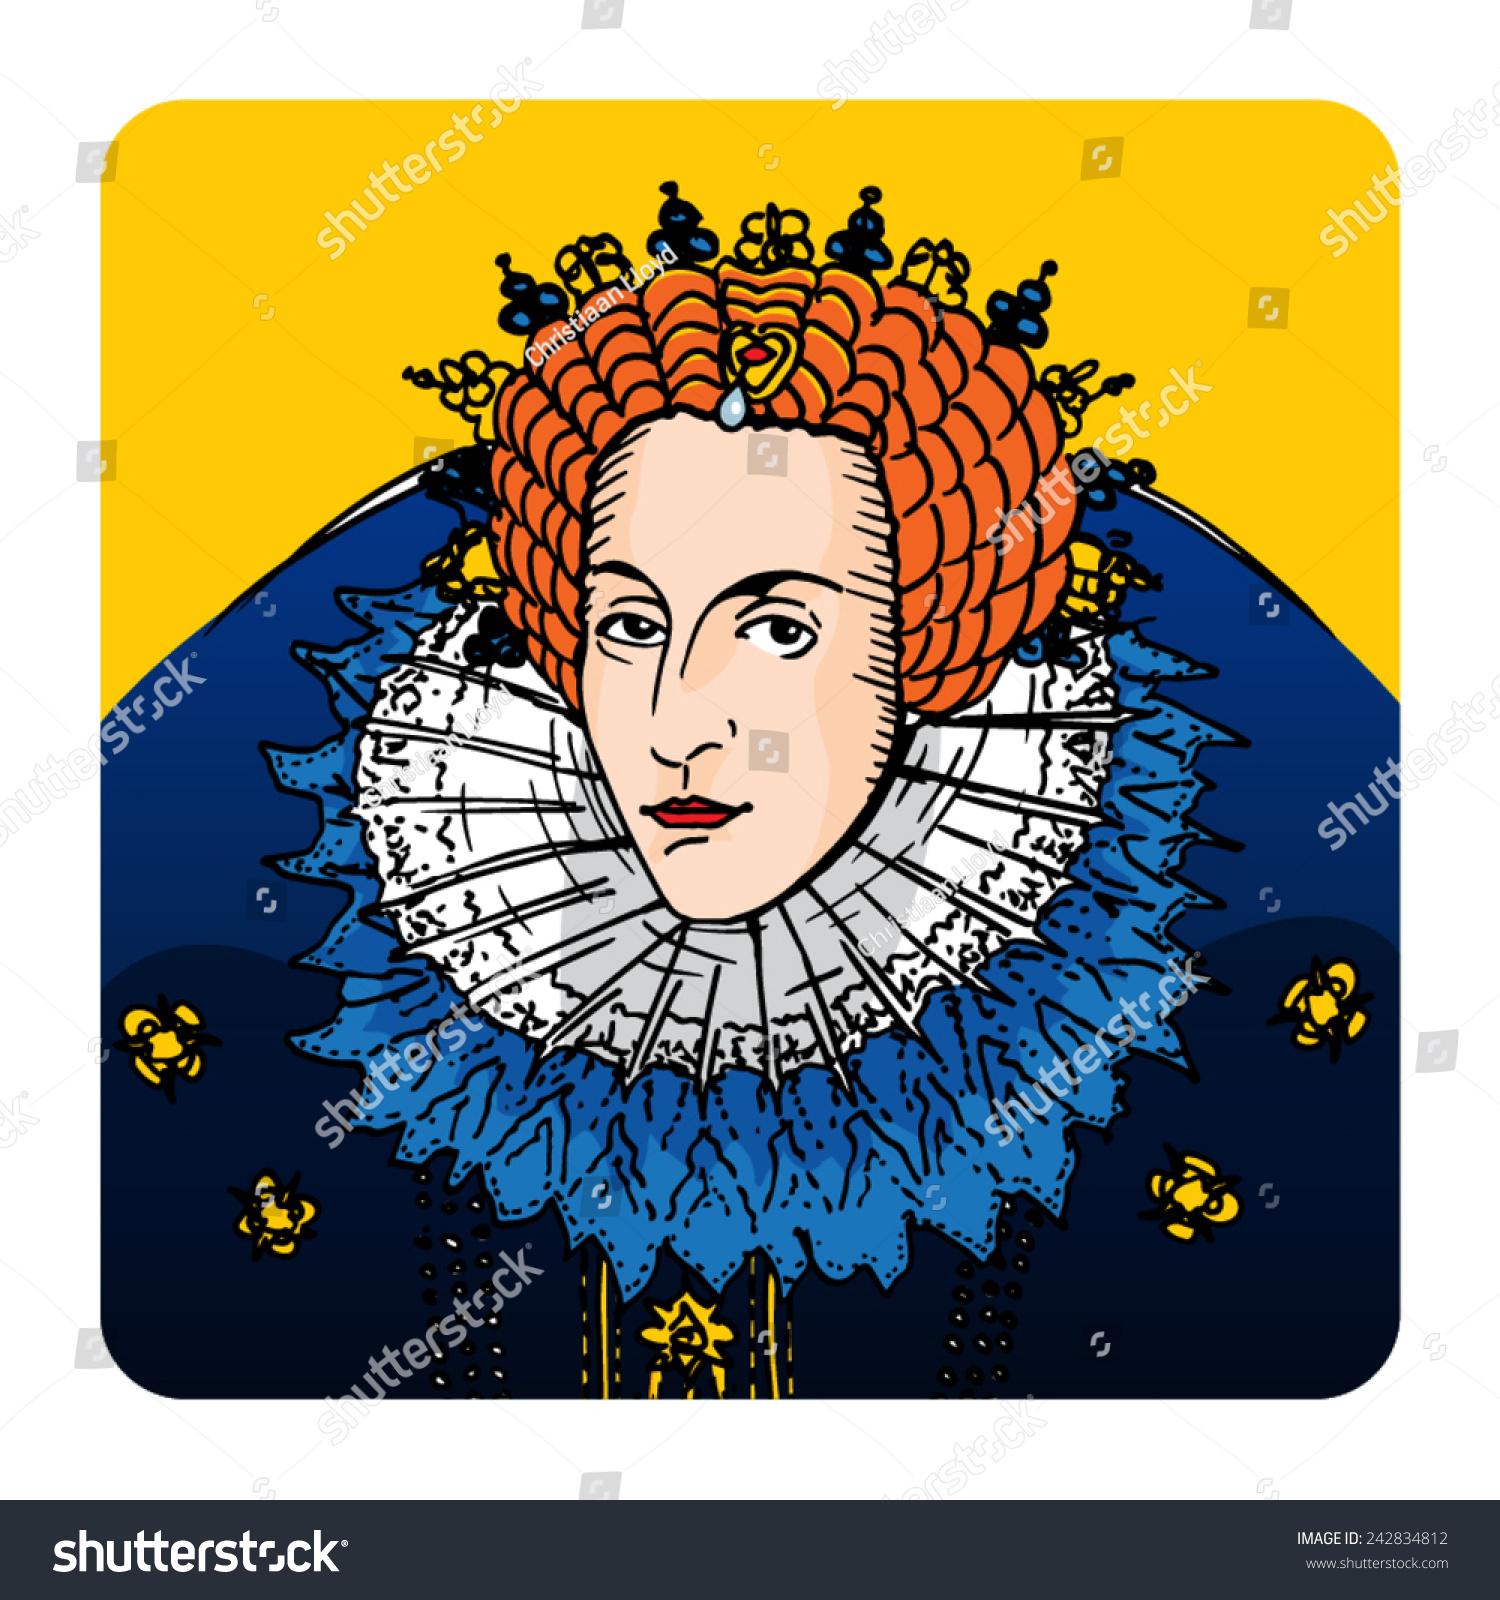 queen elizabeth cartoon clipart - photo #33